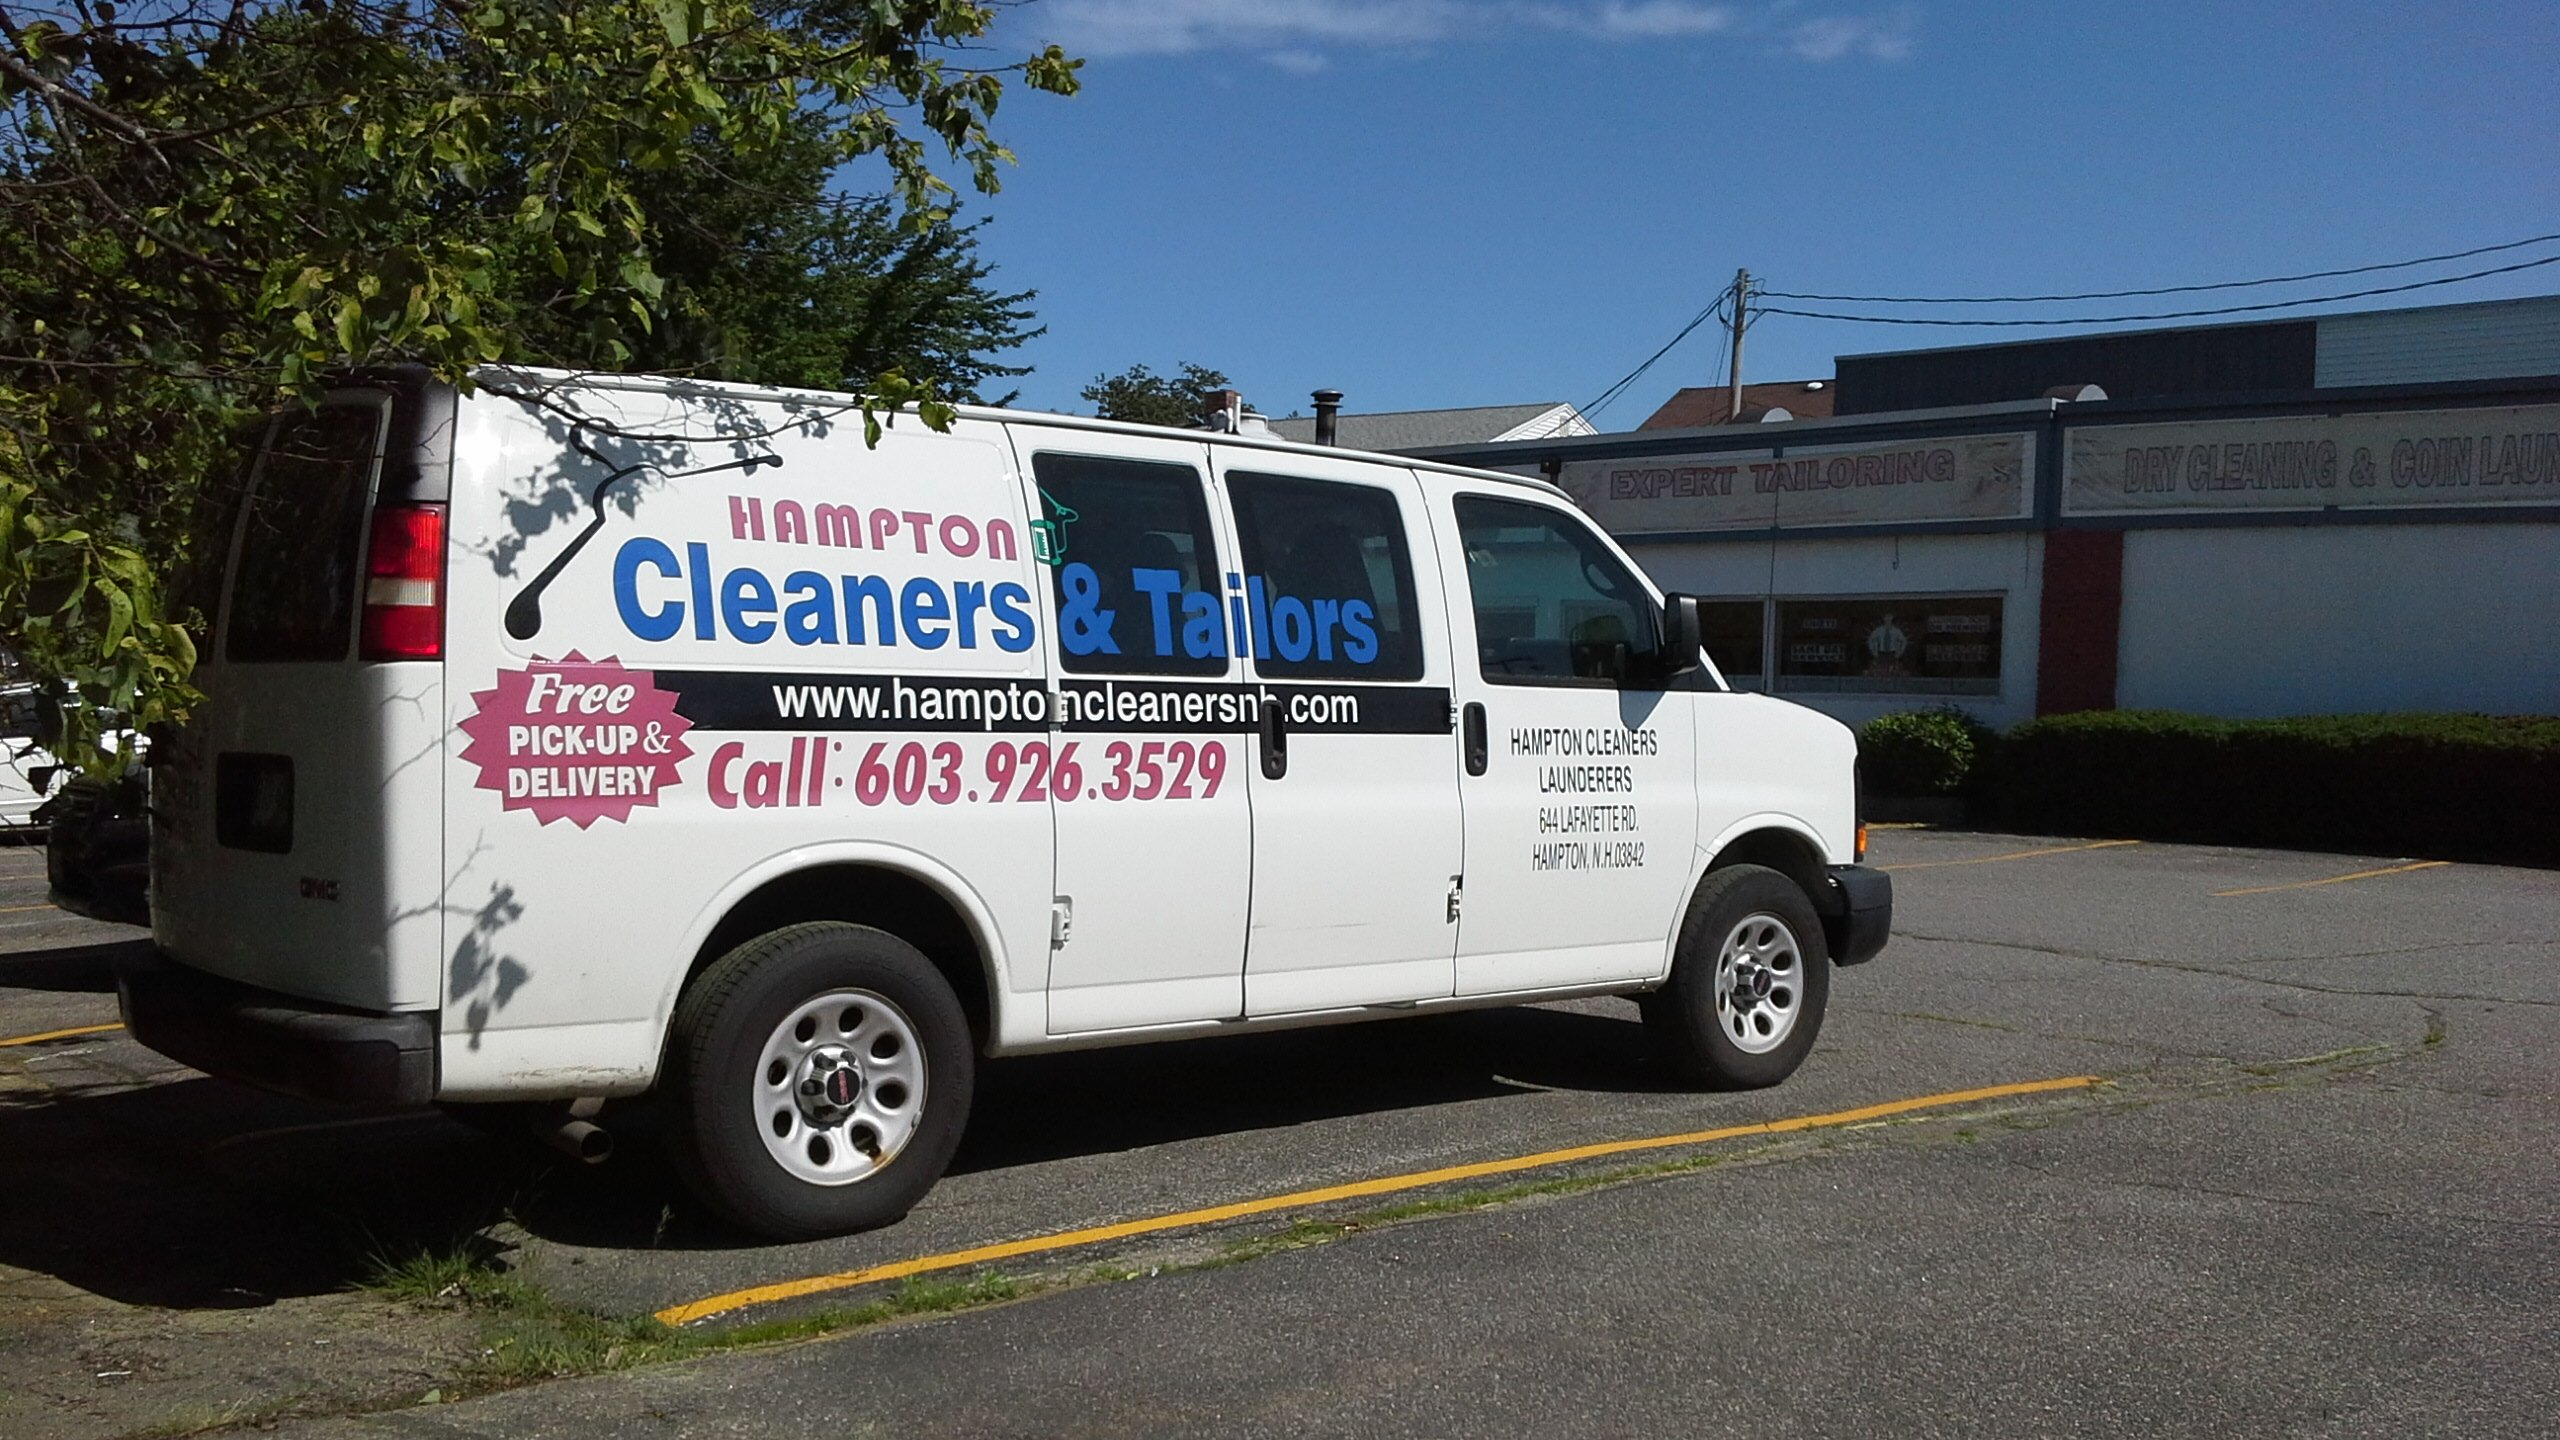 drop off laundry service Hampton, NH